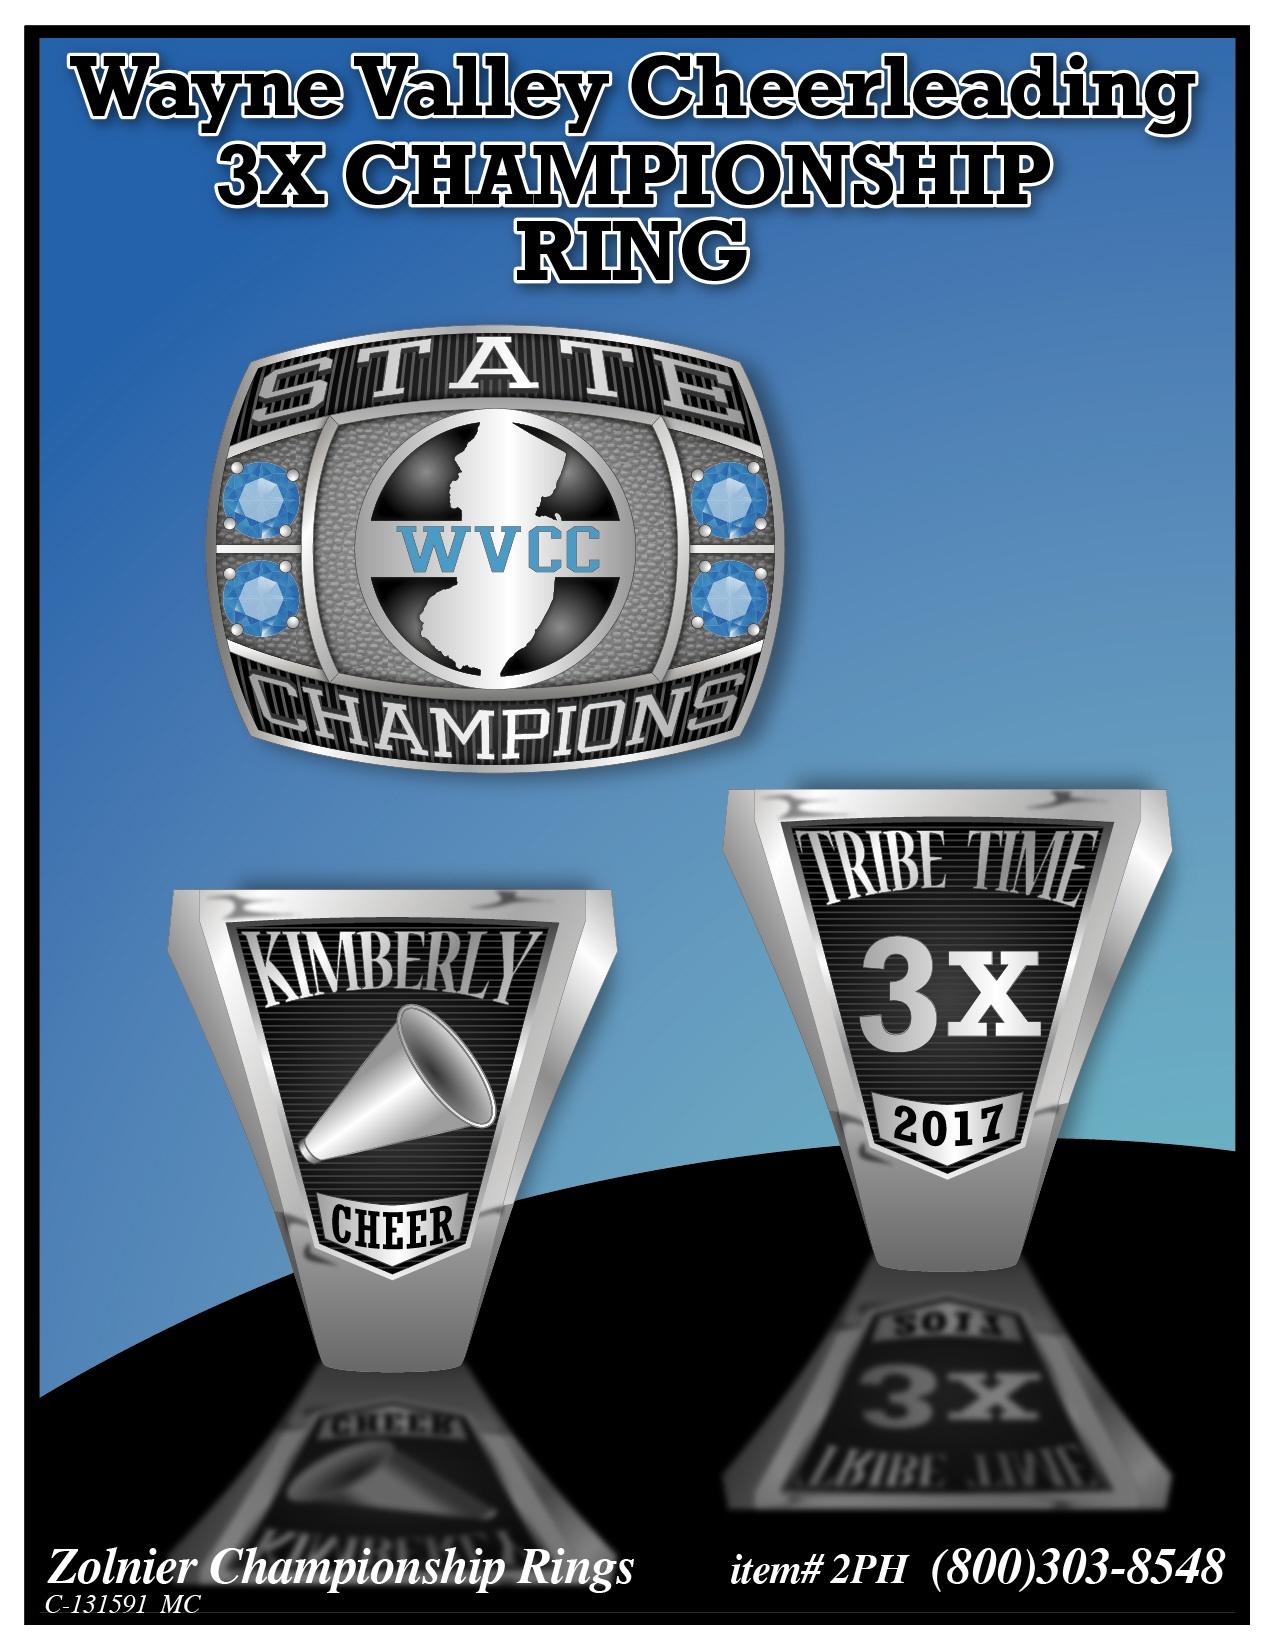 C-131591 Wayne Valley Cheerleading Ring